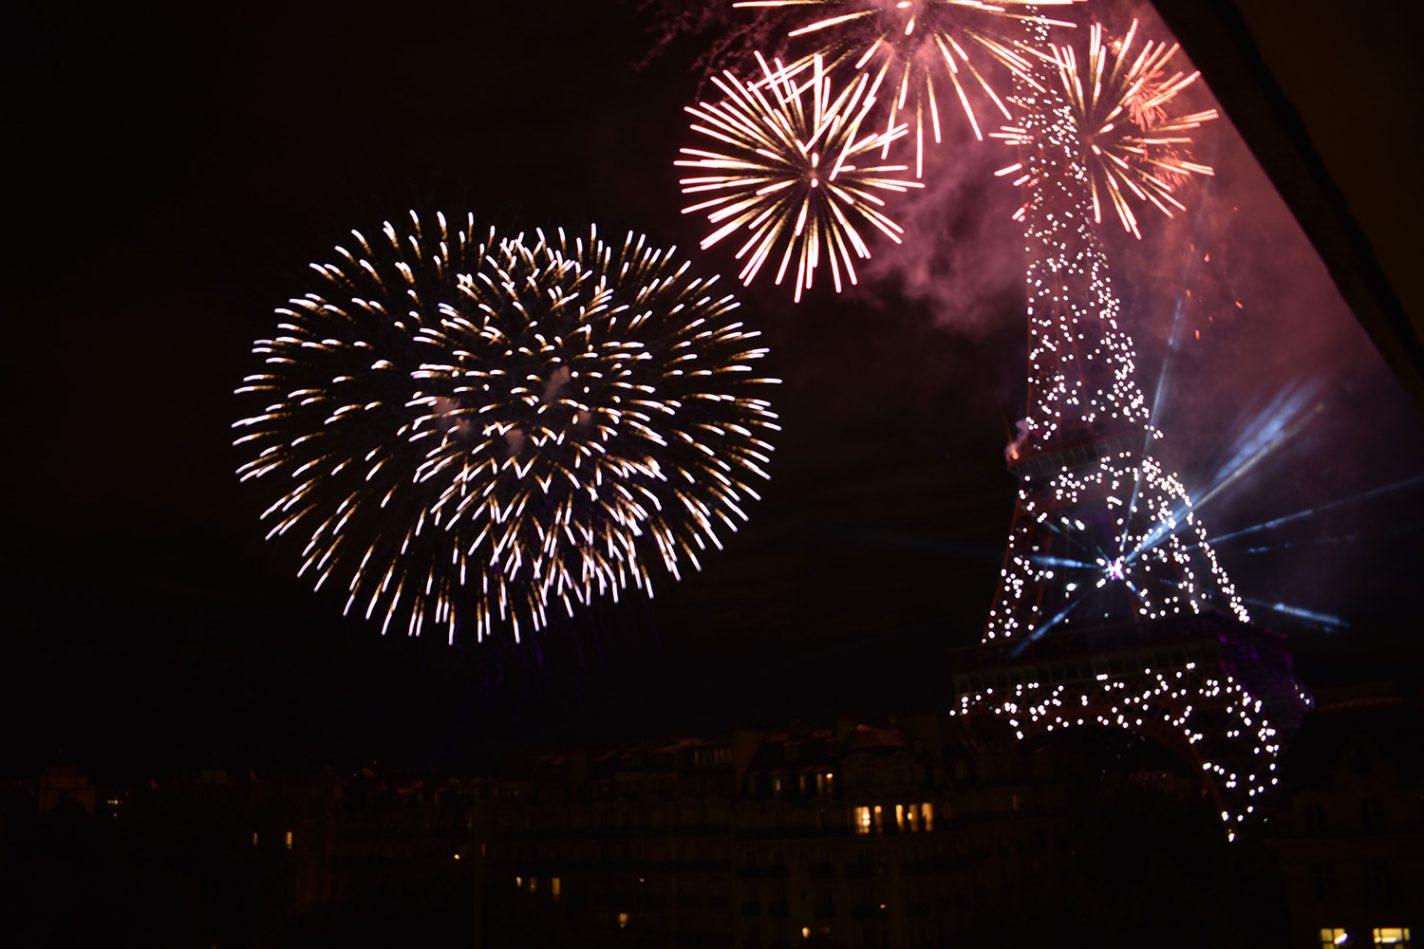 Nationale feestdag in Parijs